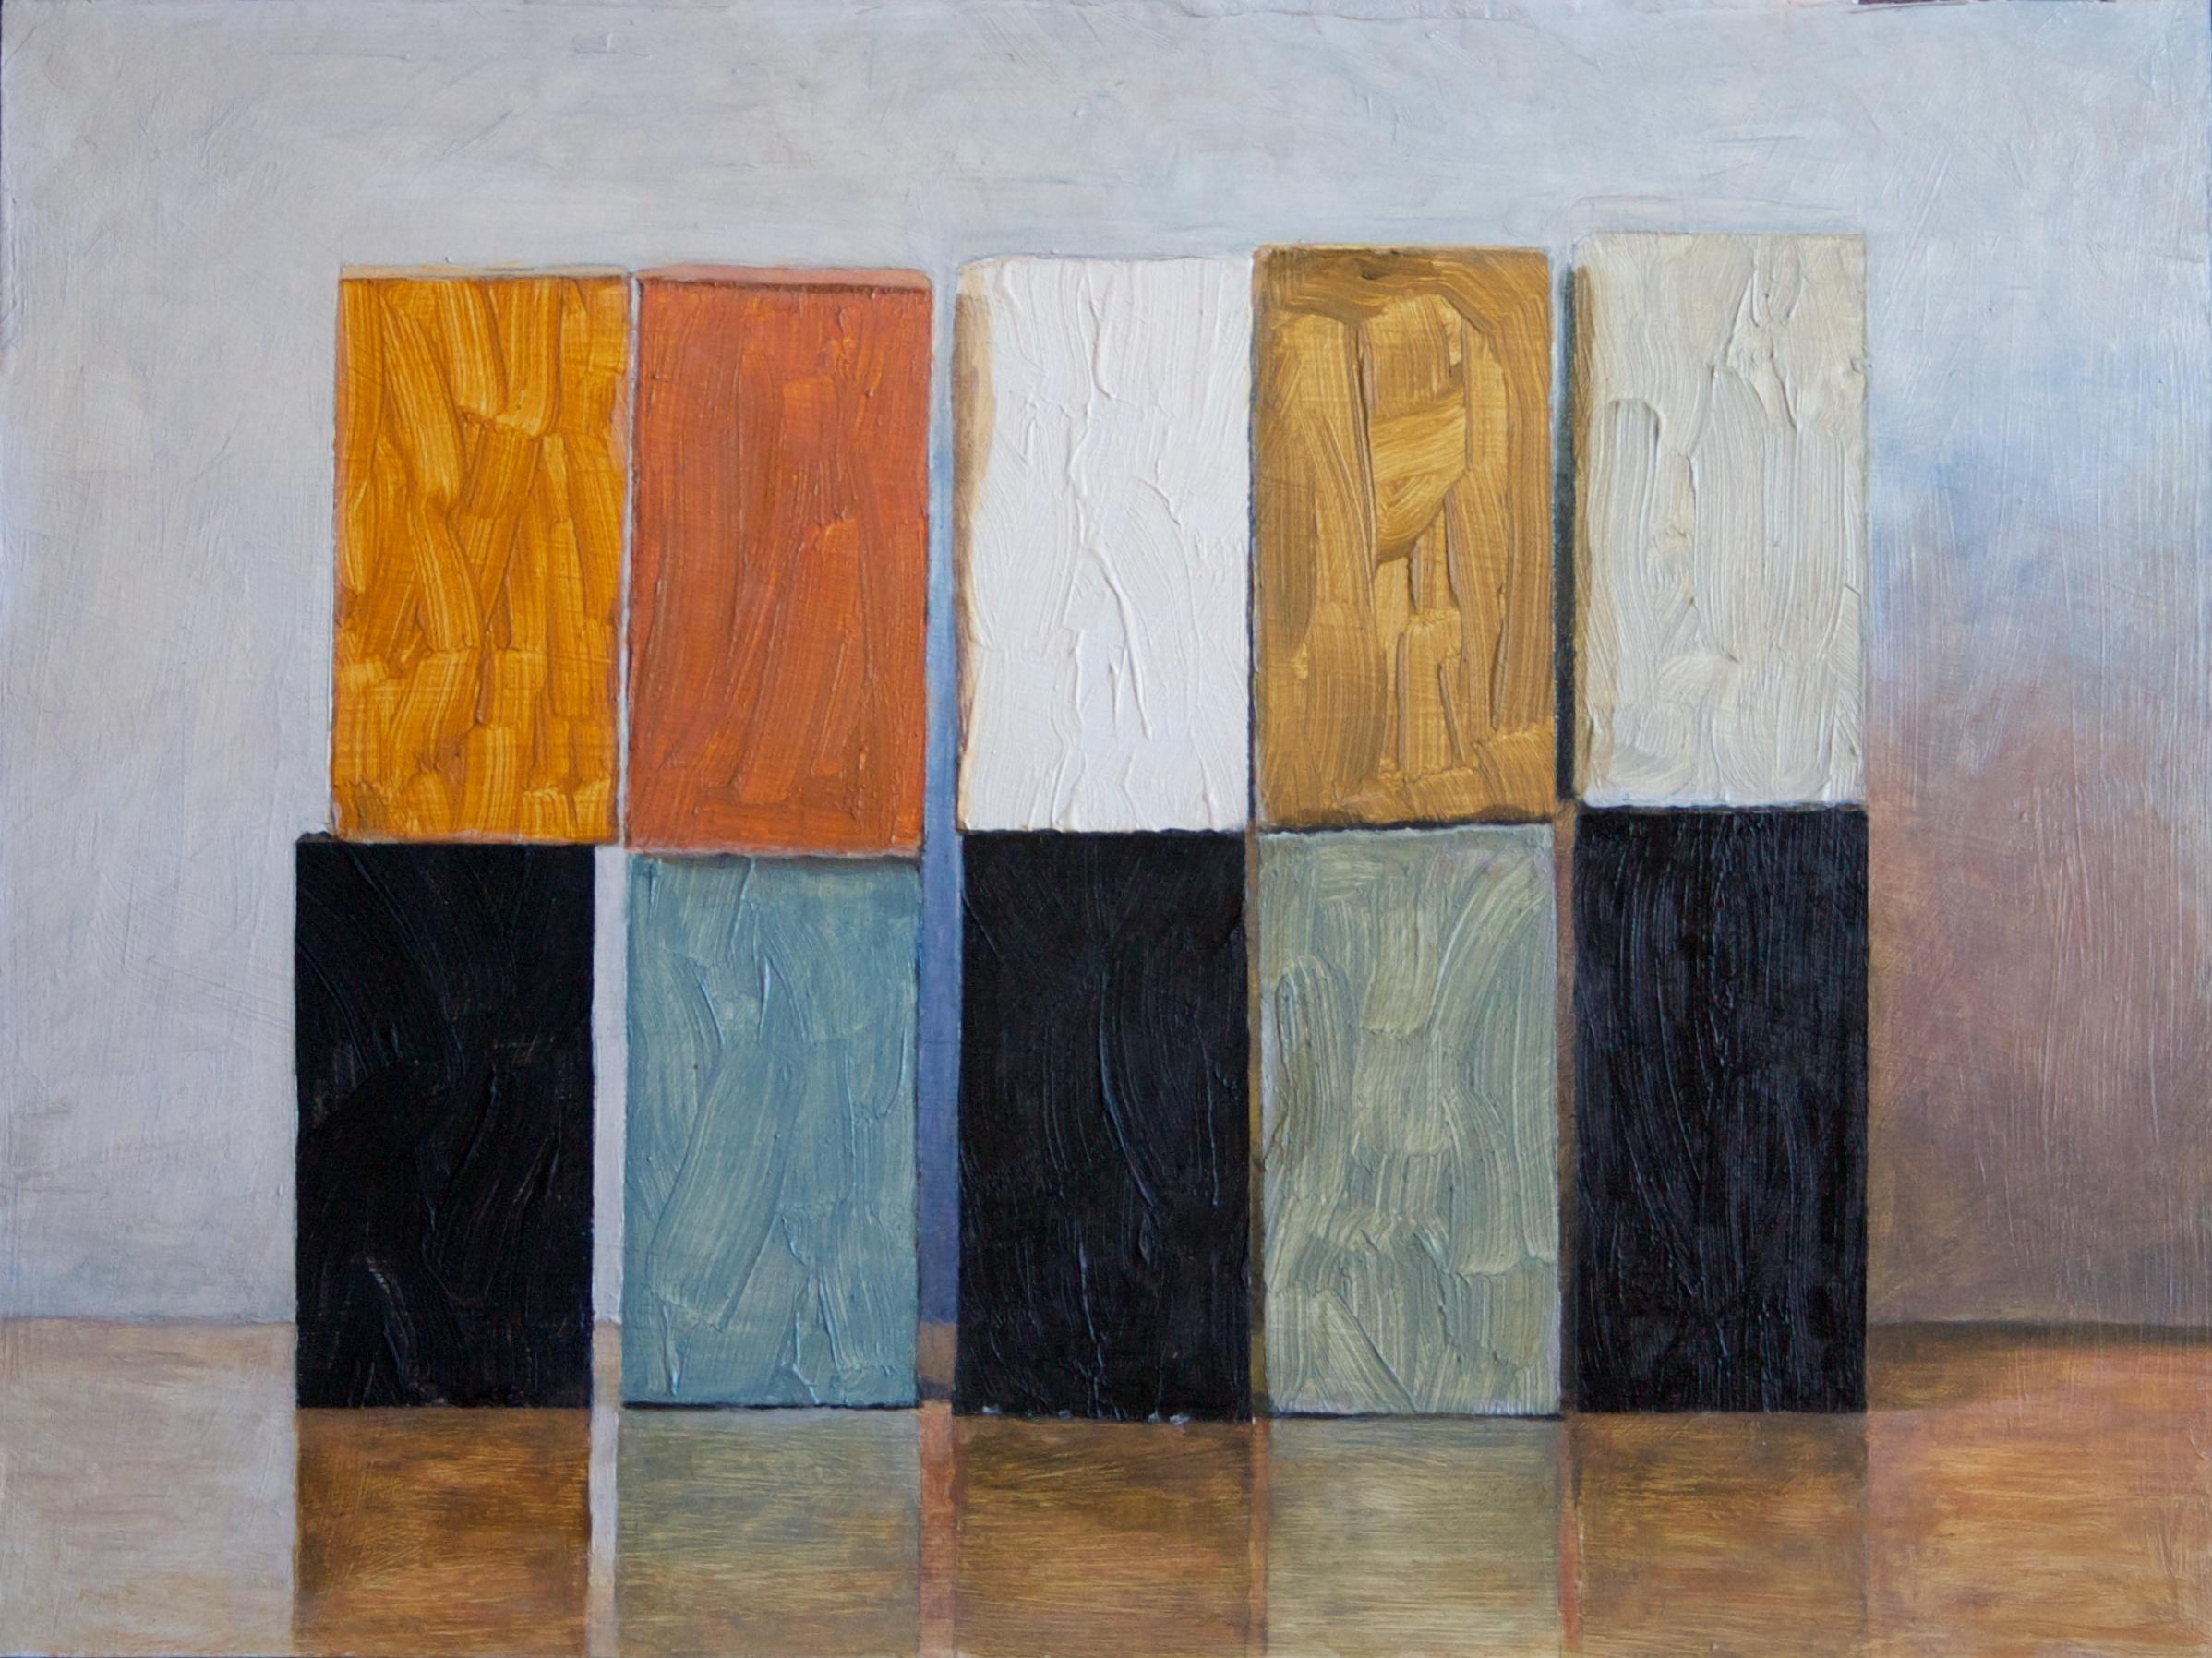 IM1011 Painted Blocks #4 (Fact of Flat) (IMG_8976).jpg